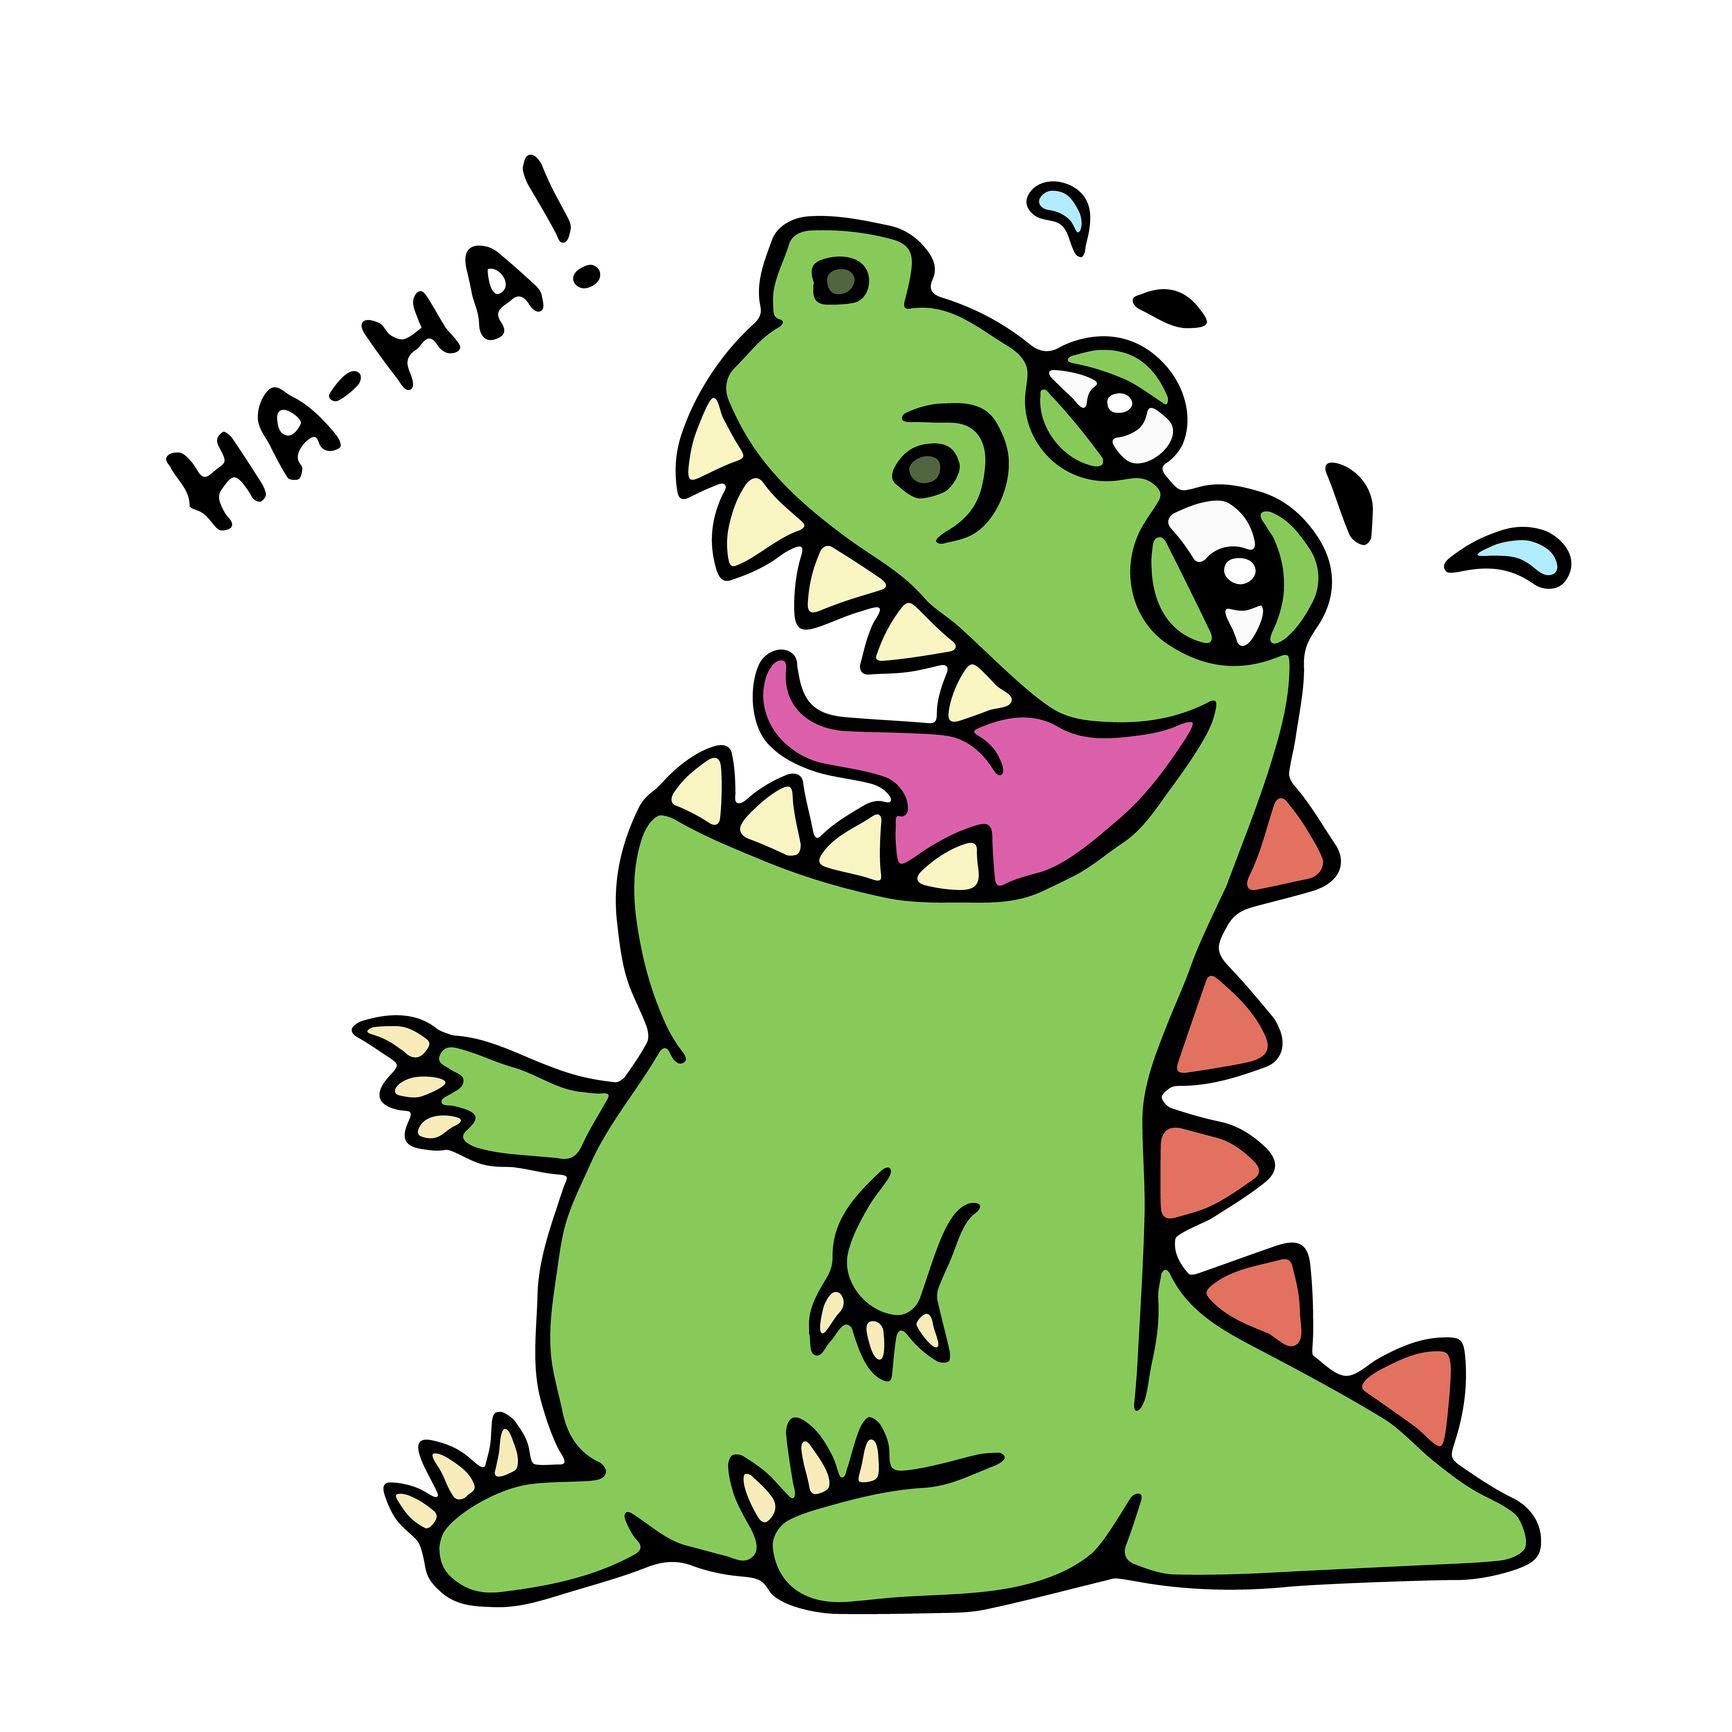 Humorous clipart woman at computer paying bills svg transparent The World\'s Funniest Dinosaur Jokes svg transparent